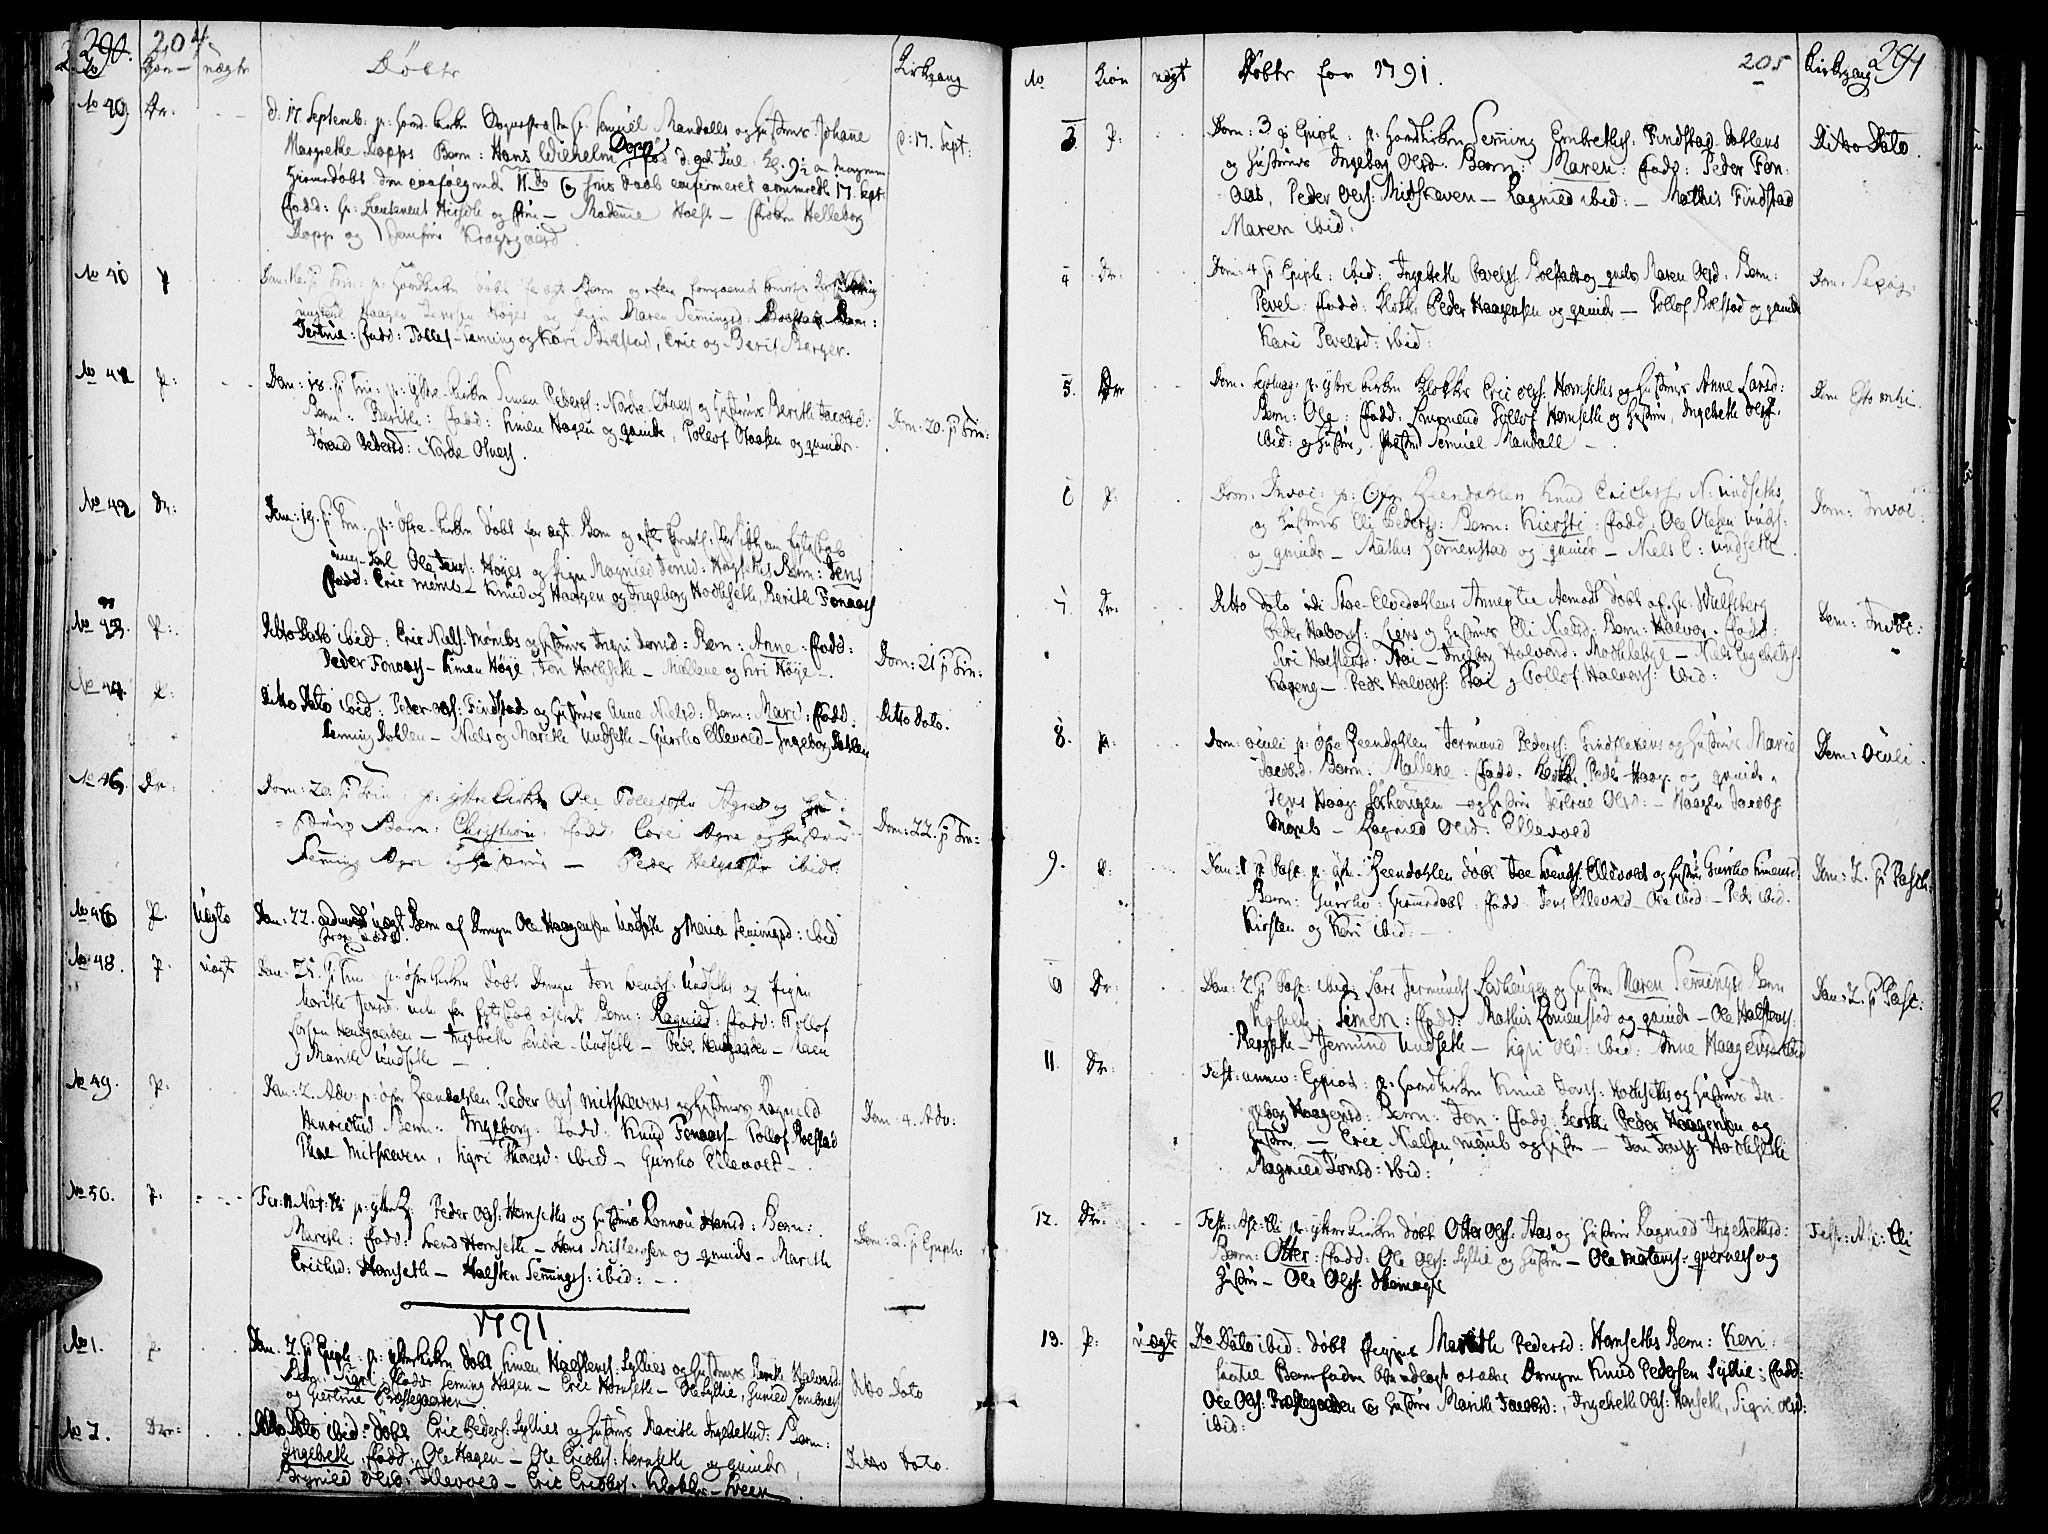 SAH, Rendalen prestekontor, H/Ha/Haa/L0002: Ministerialbok nr. 2, 1788-1814, s. 204-205